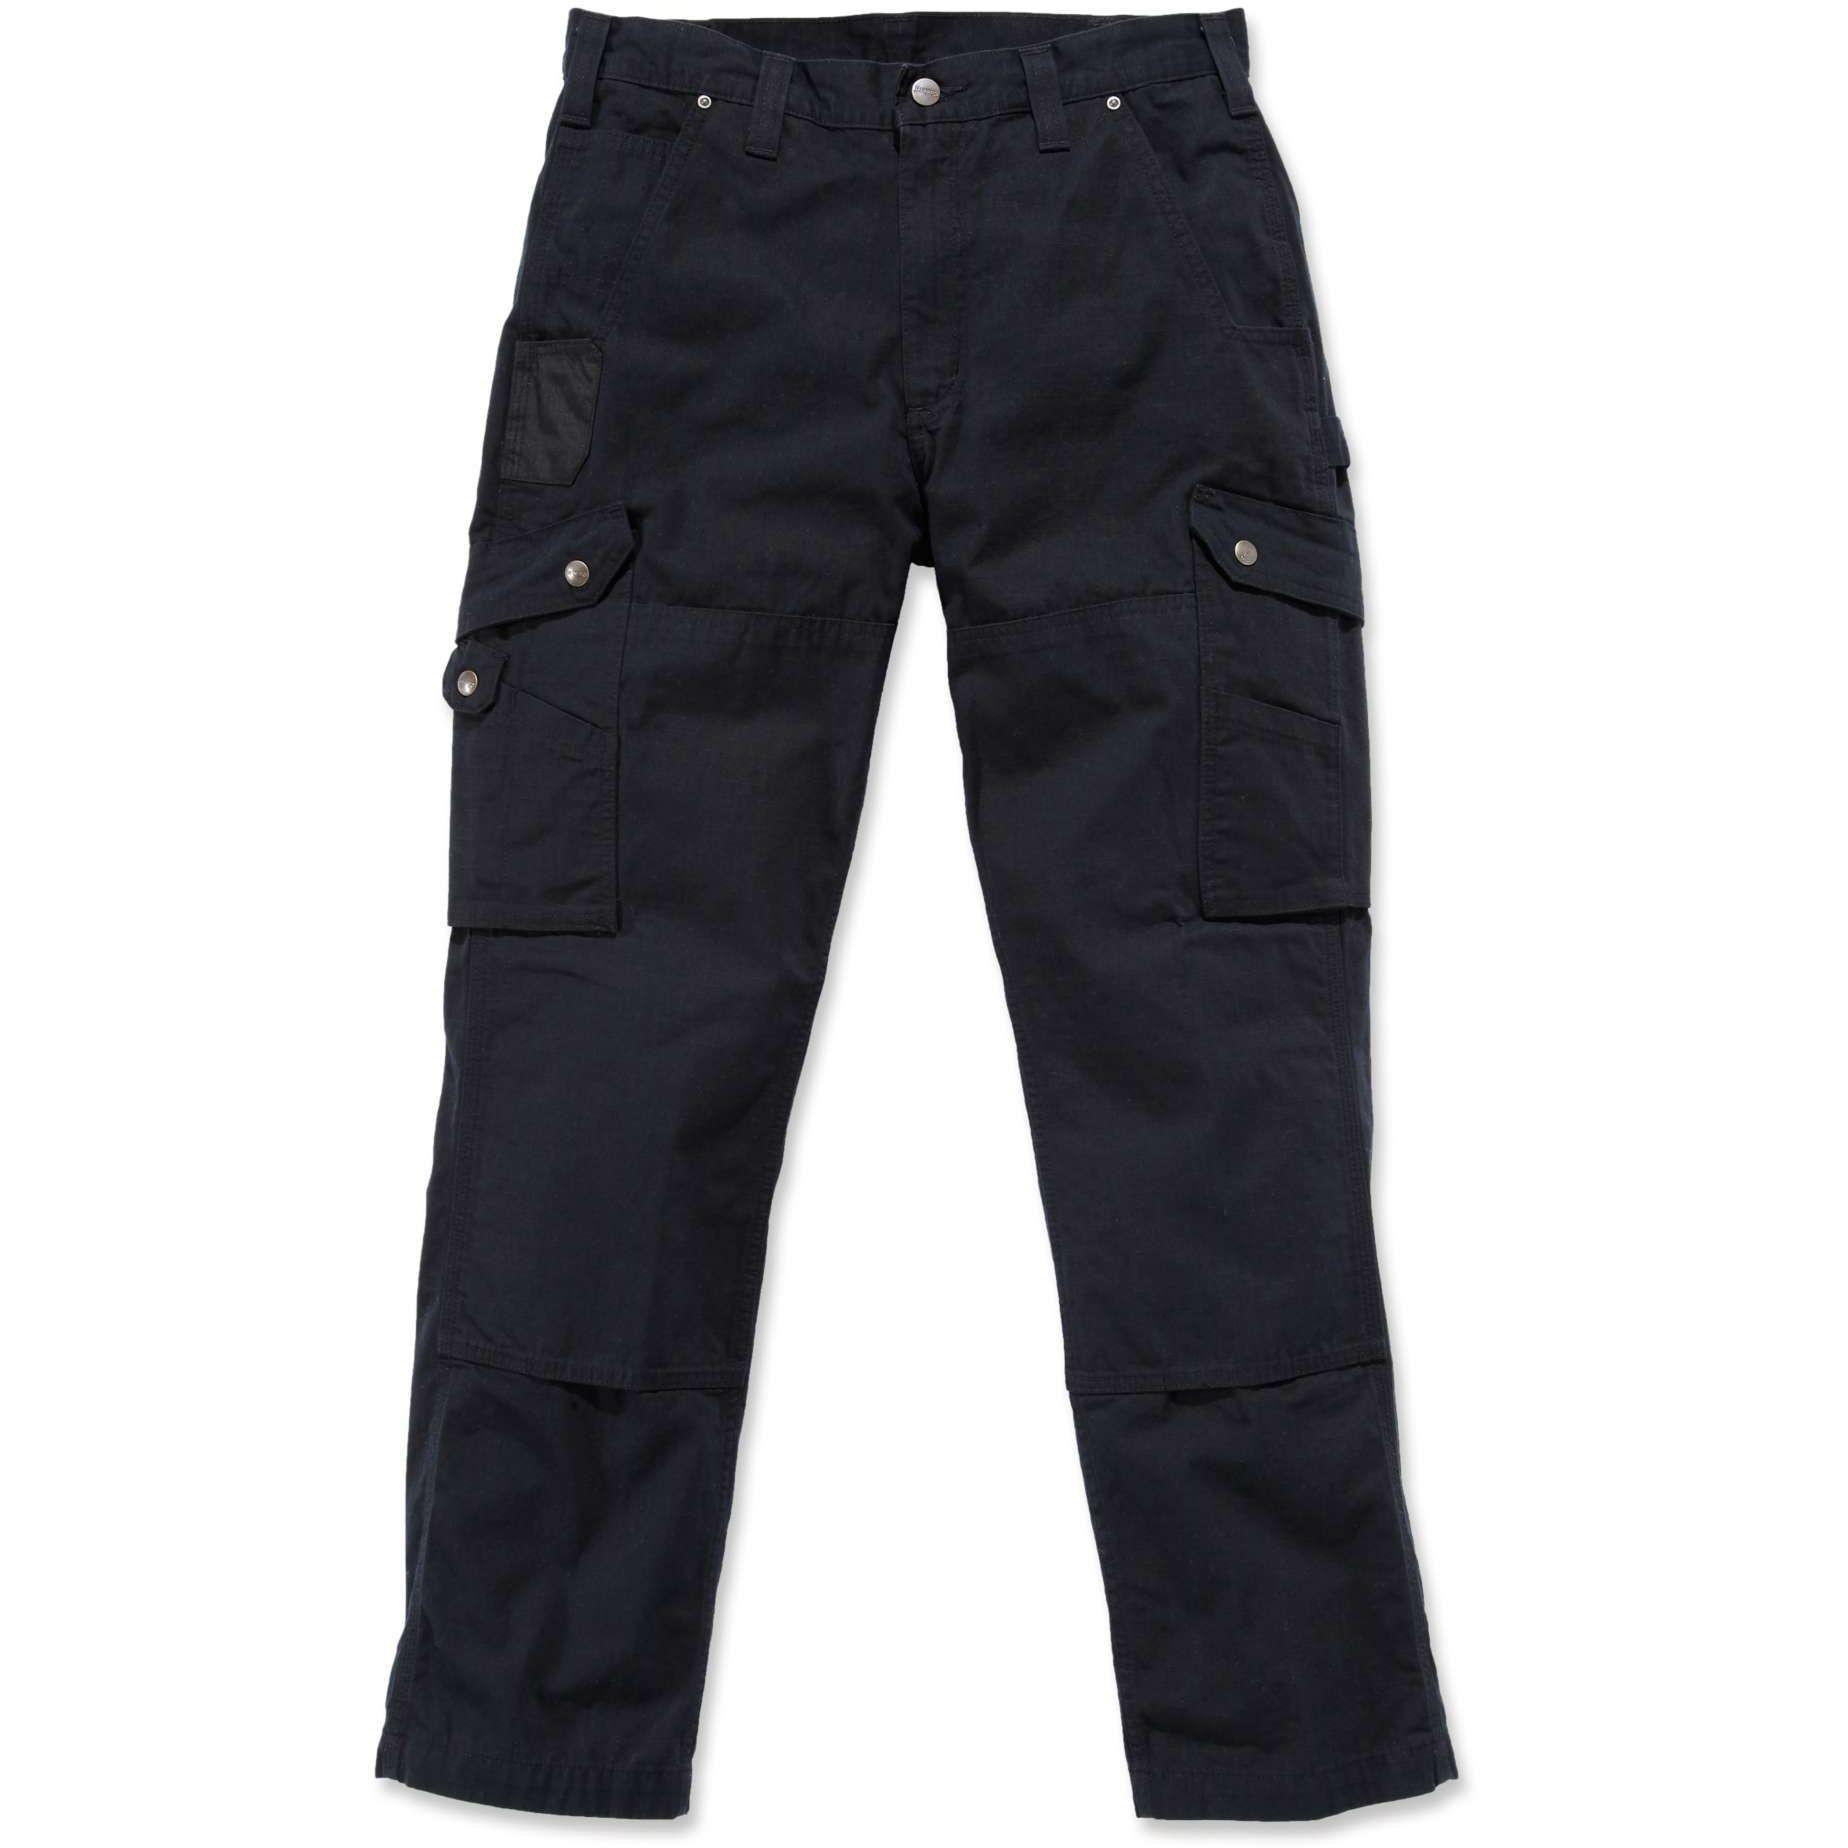 Carhartt Ripstop Cargo Work Pant Pantalon Homme